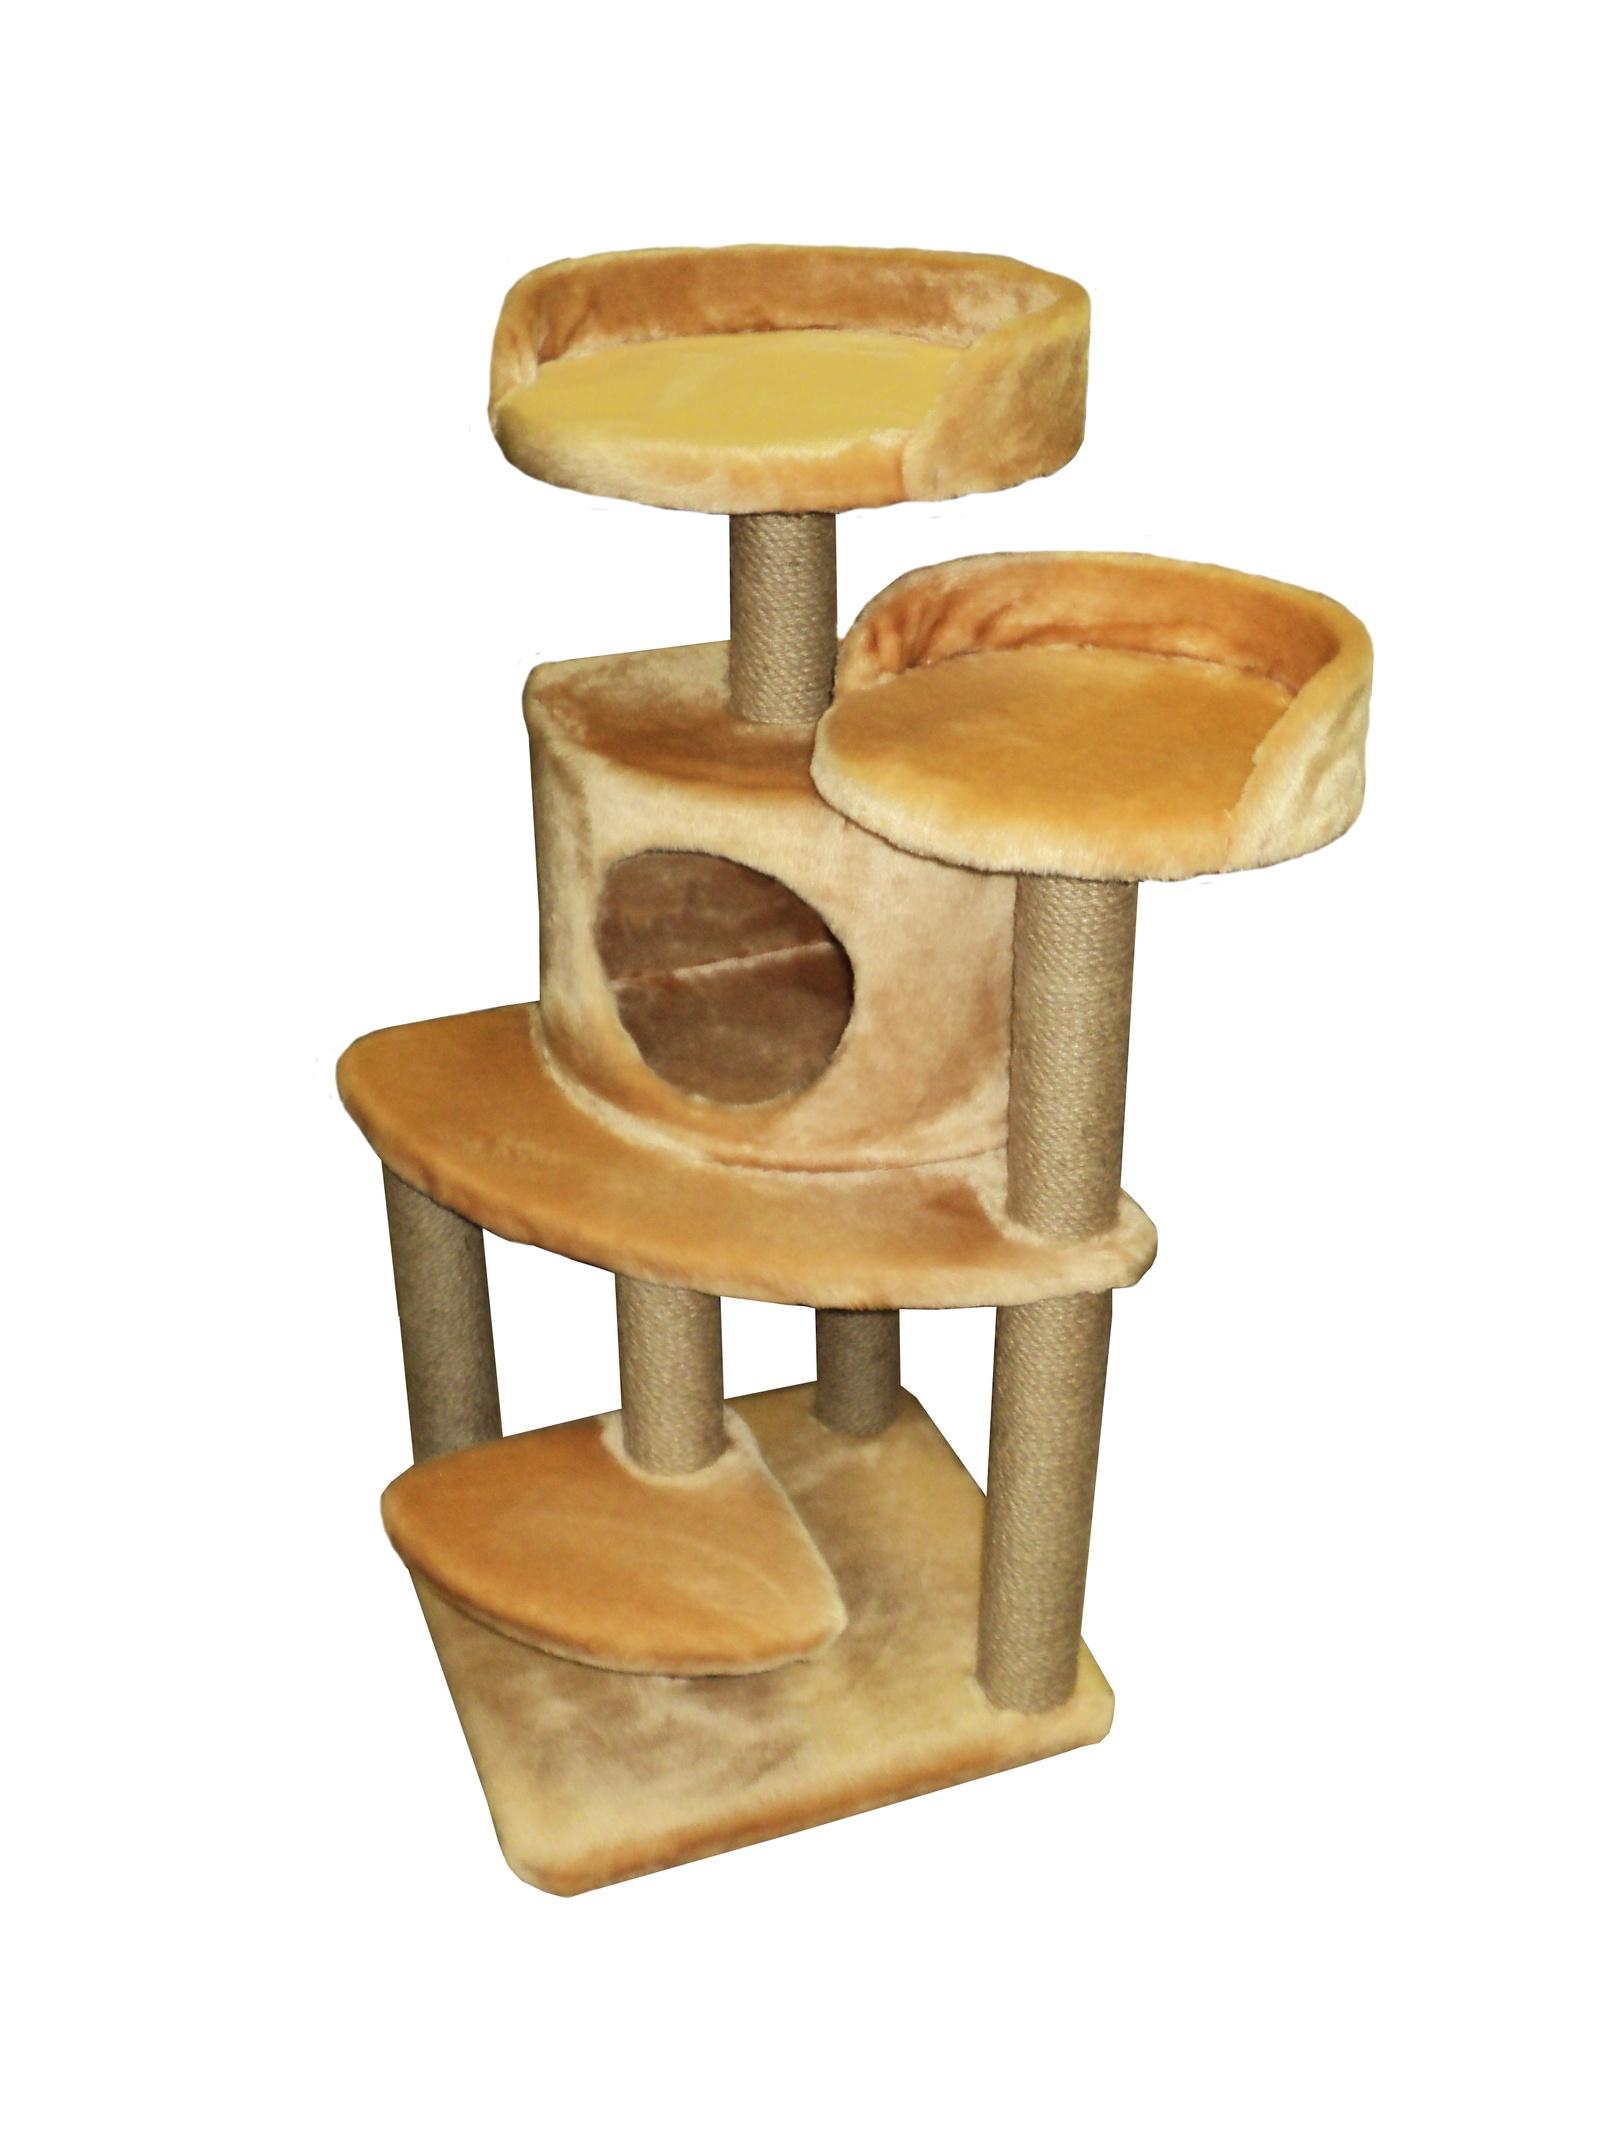 Домик - когтеточка Майя, кремовый, джут 50х50х100 домик когтеточка барсик серый джут 60х60х110